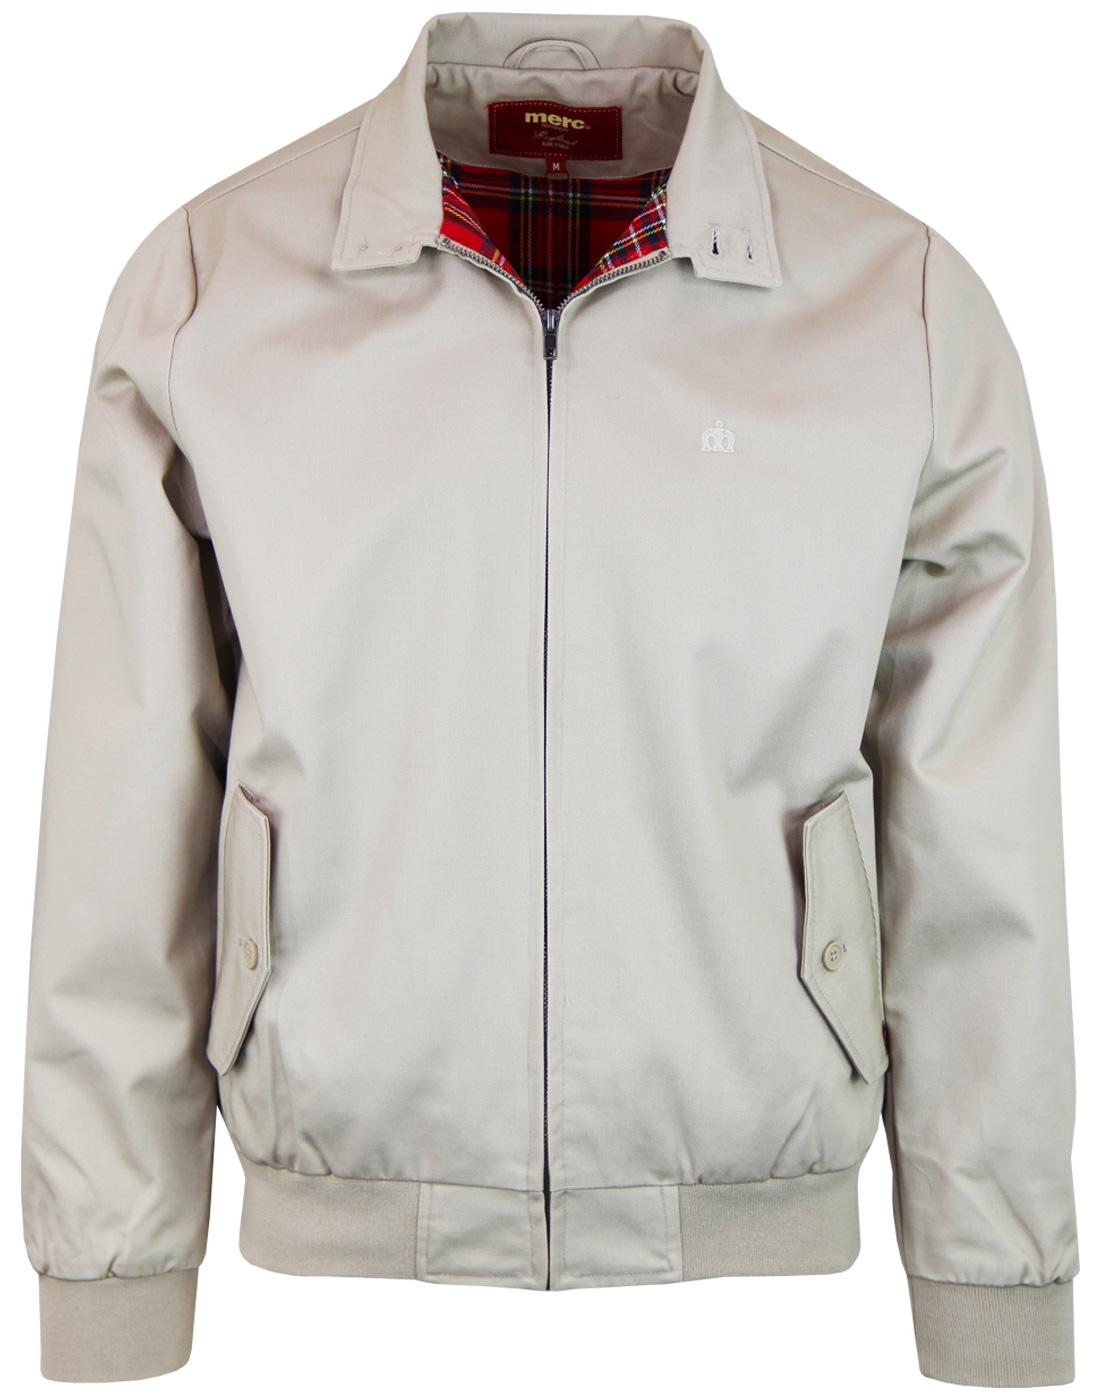 MERC Retro Mod Classic Harrington Jacket (BEIGE)